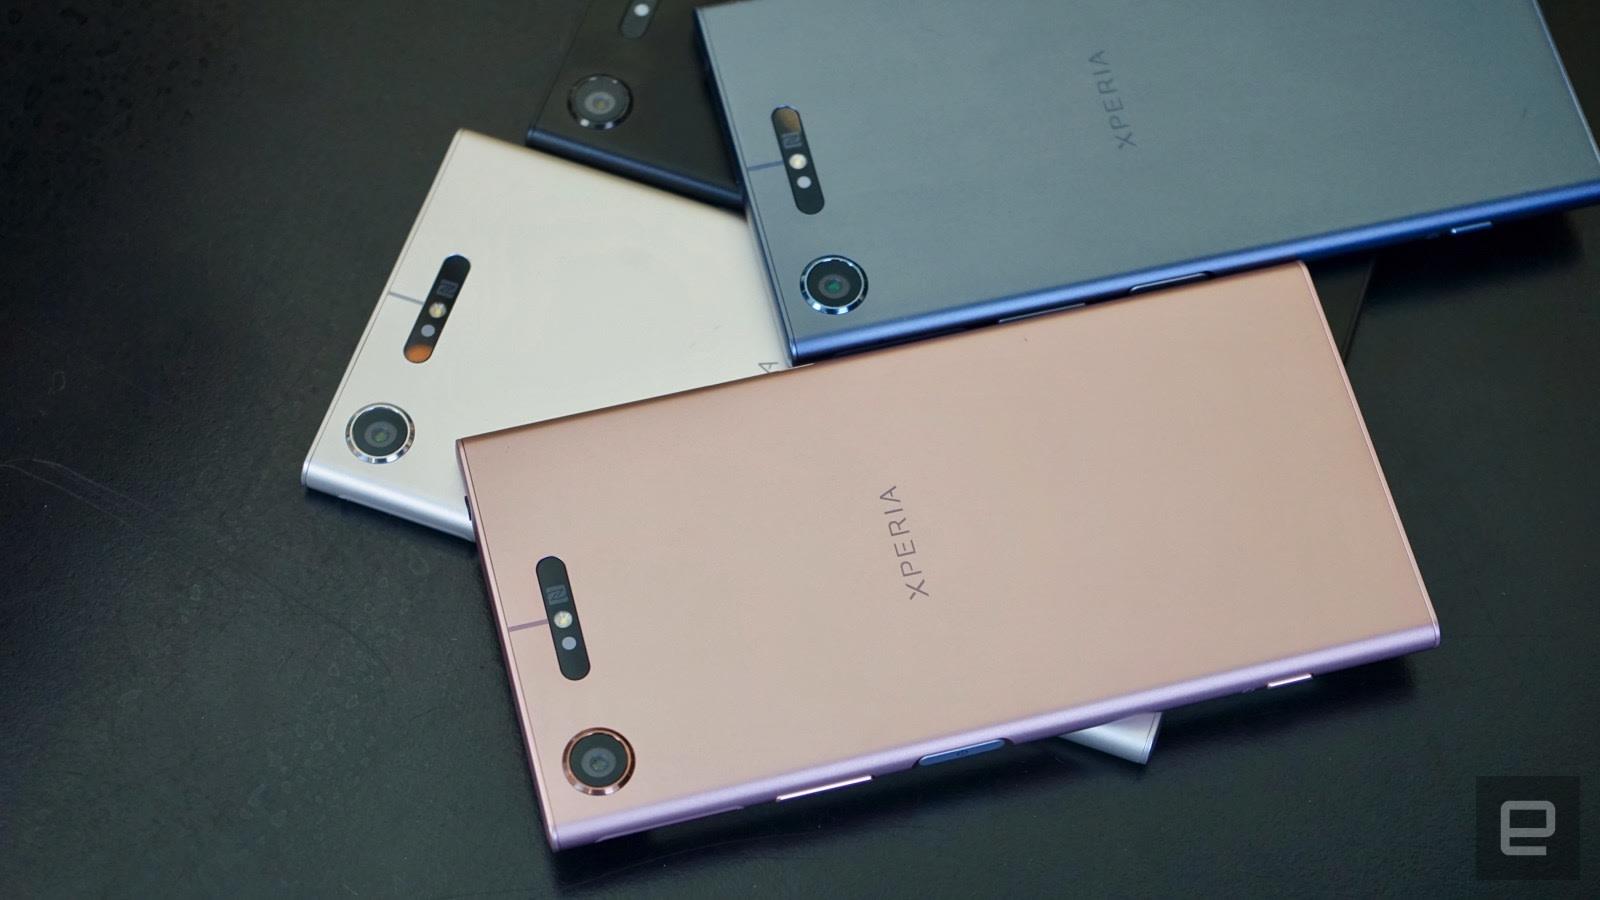 Sony Xperia XZ1 hands-on: Pricey camera tricks